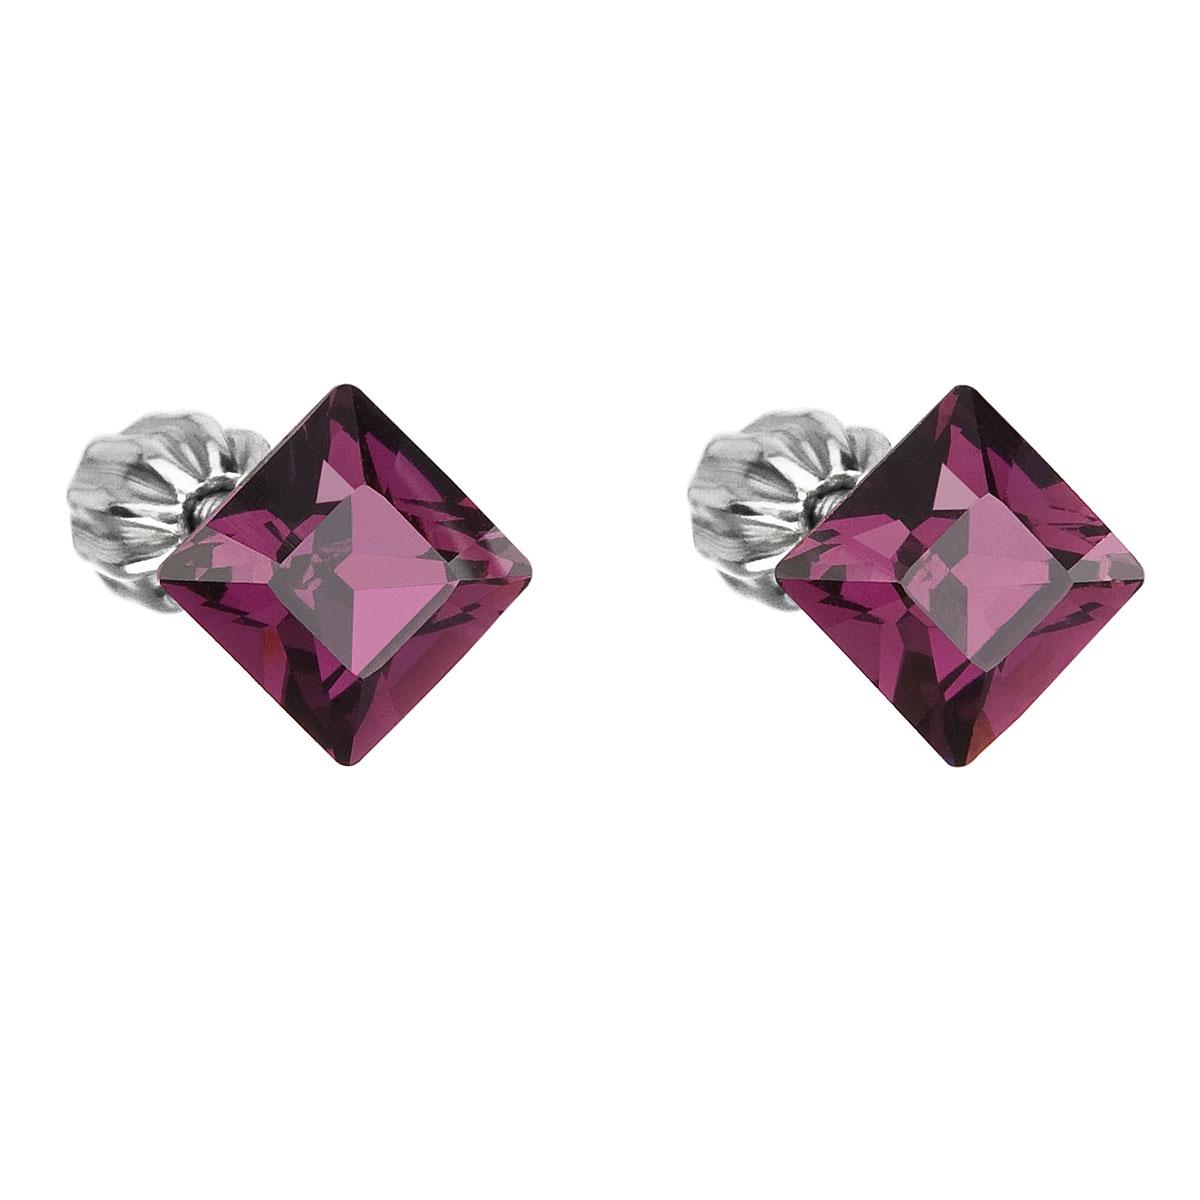 Evolution Group Stříbrné náušnice pecka s krystaly Swarovski fialový čtverec 31065.3